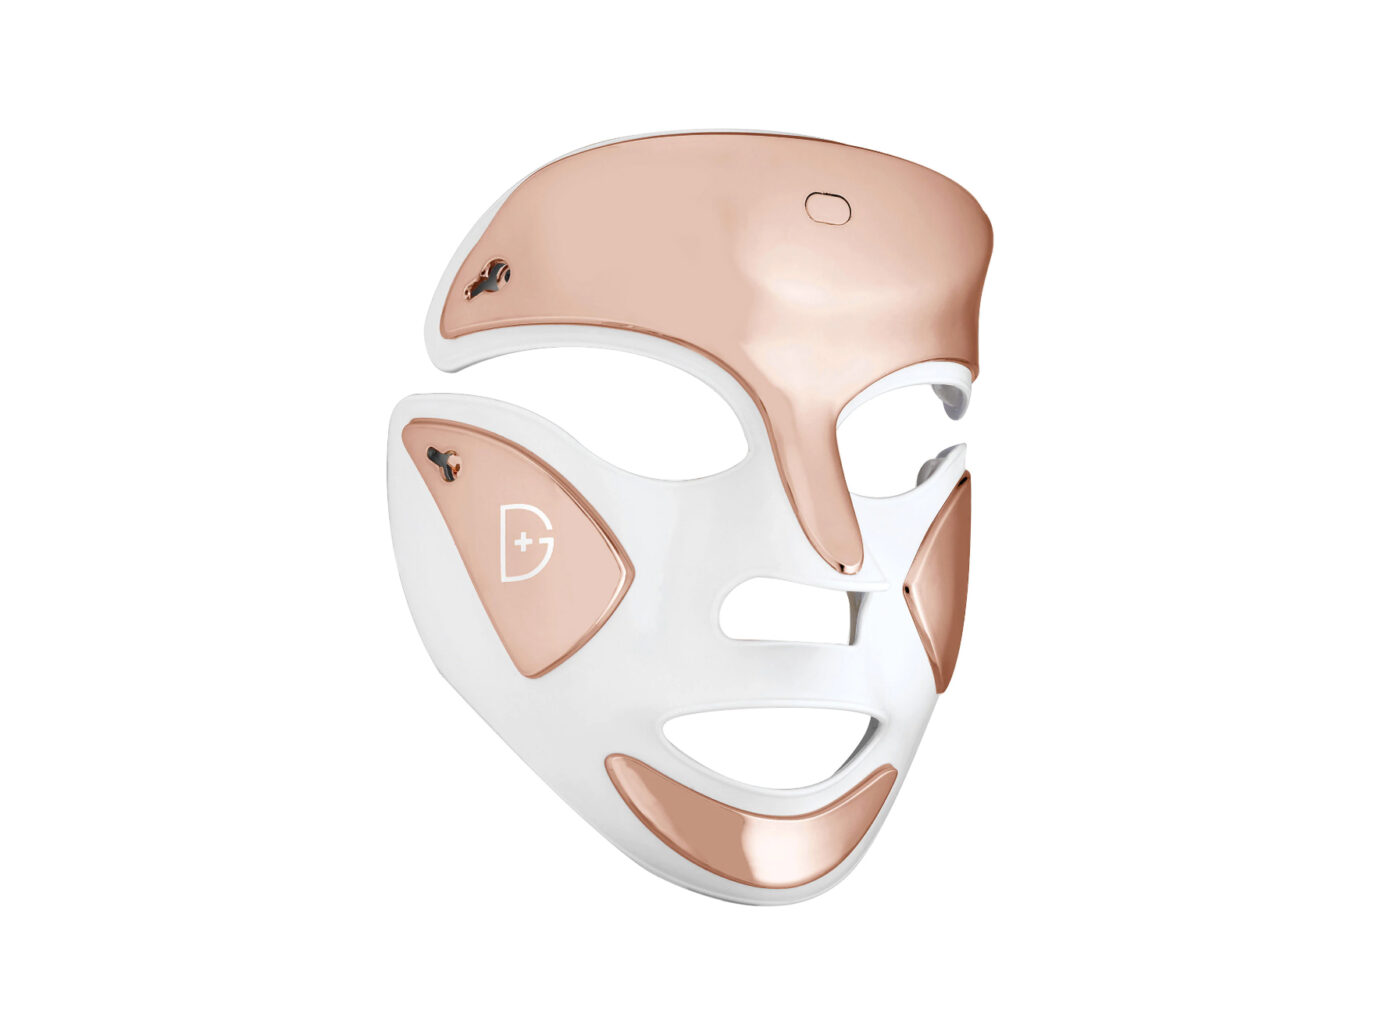 Dr. Dennis Gross SpectraLite Faceware Pro Device